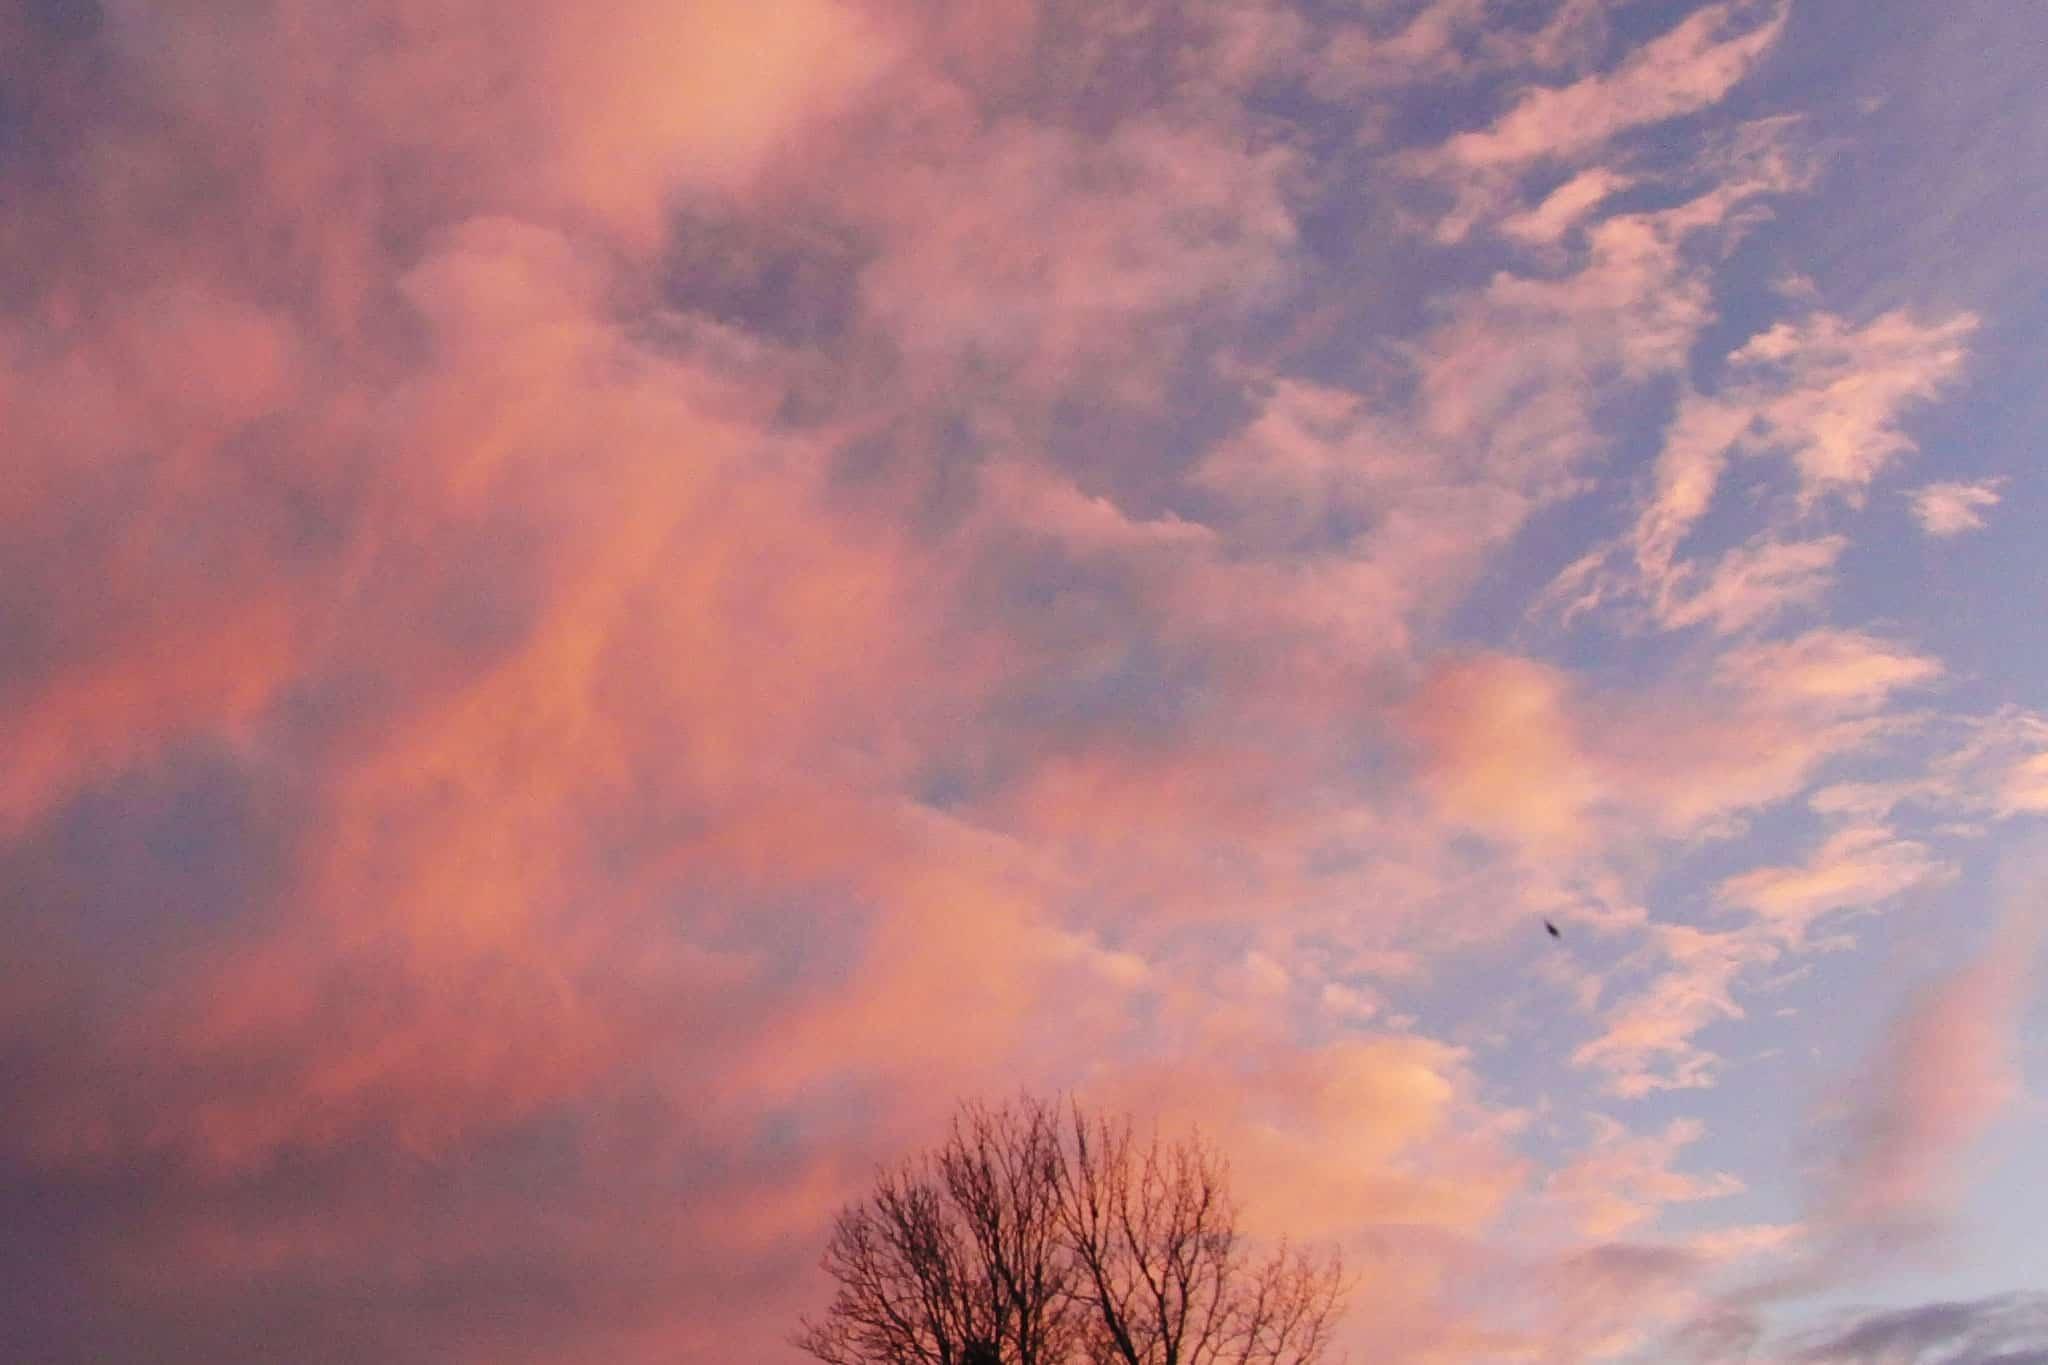 Rosa Wolken am Himmel - Richtung Grimming - Sonnenalm Bad Mitterndorf